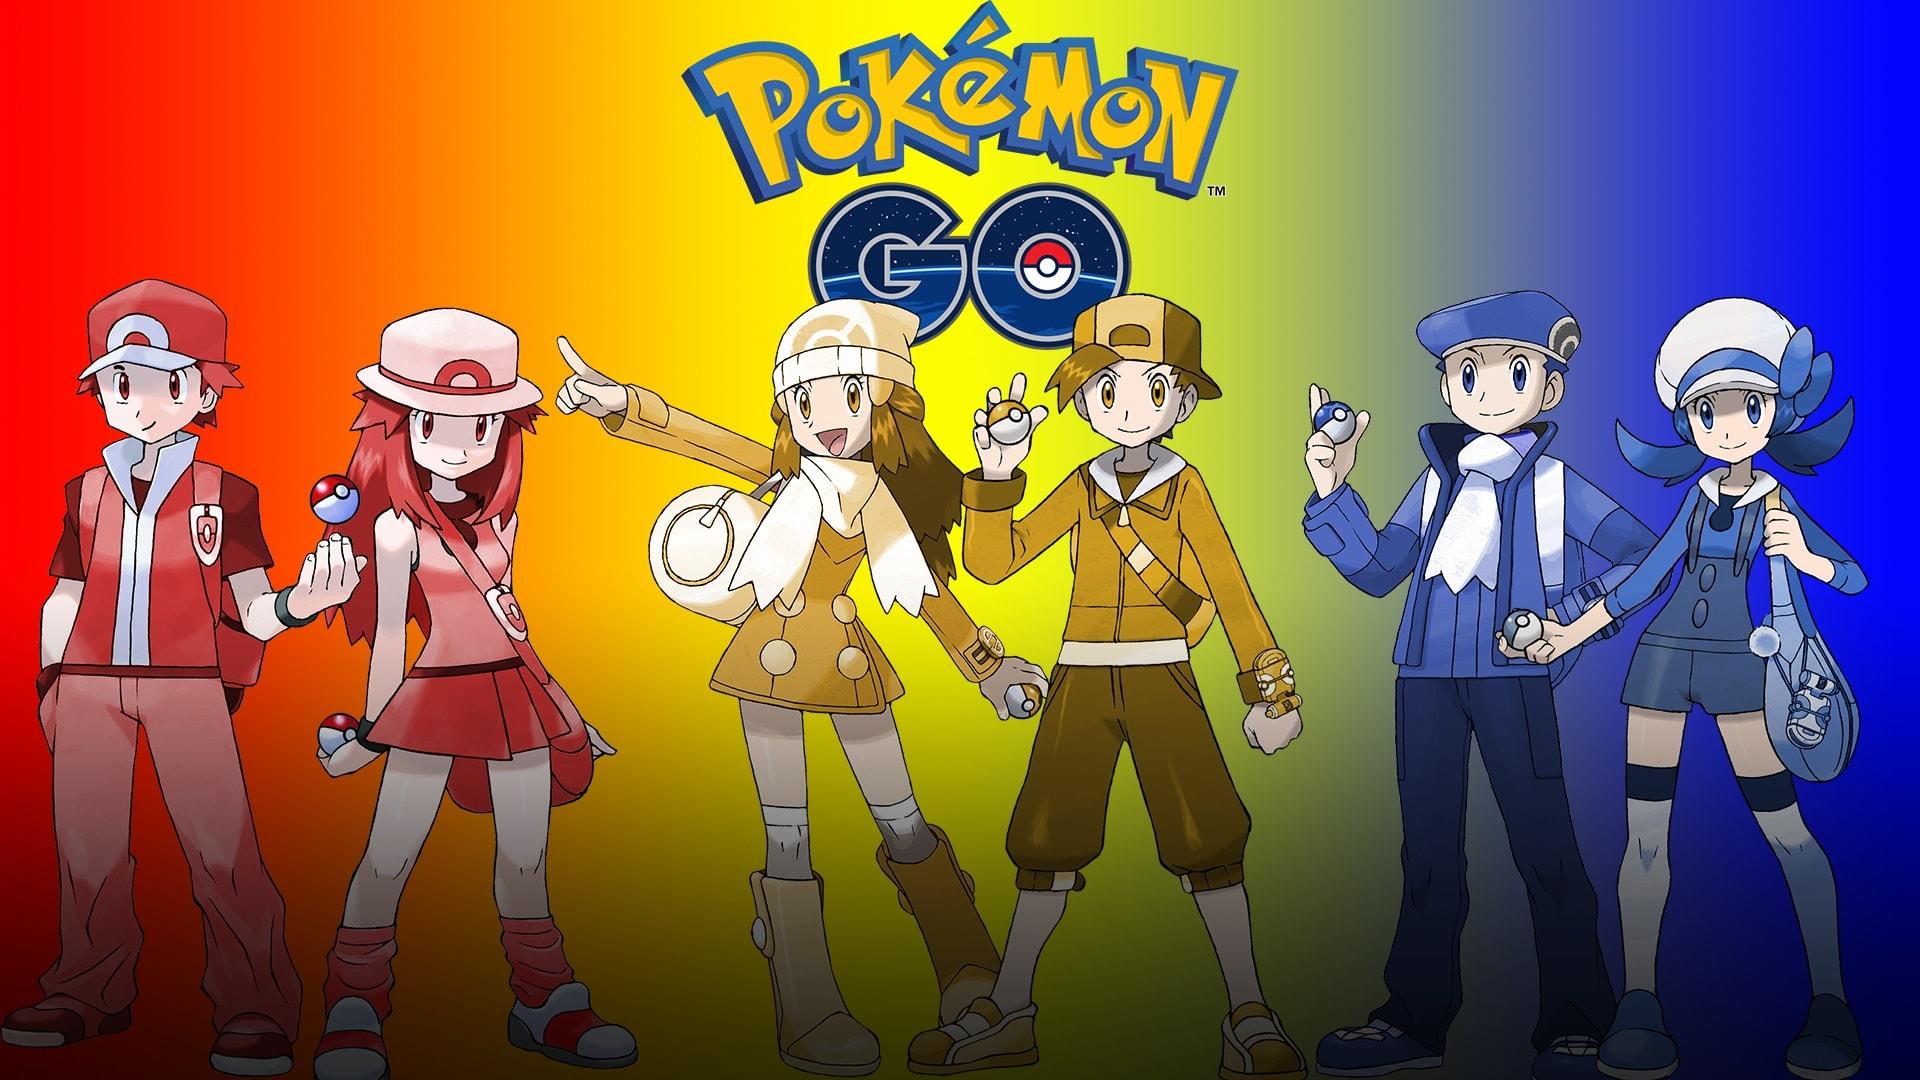 Pokemon Go HQ wallpapers